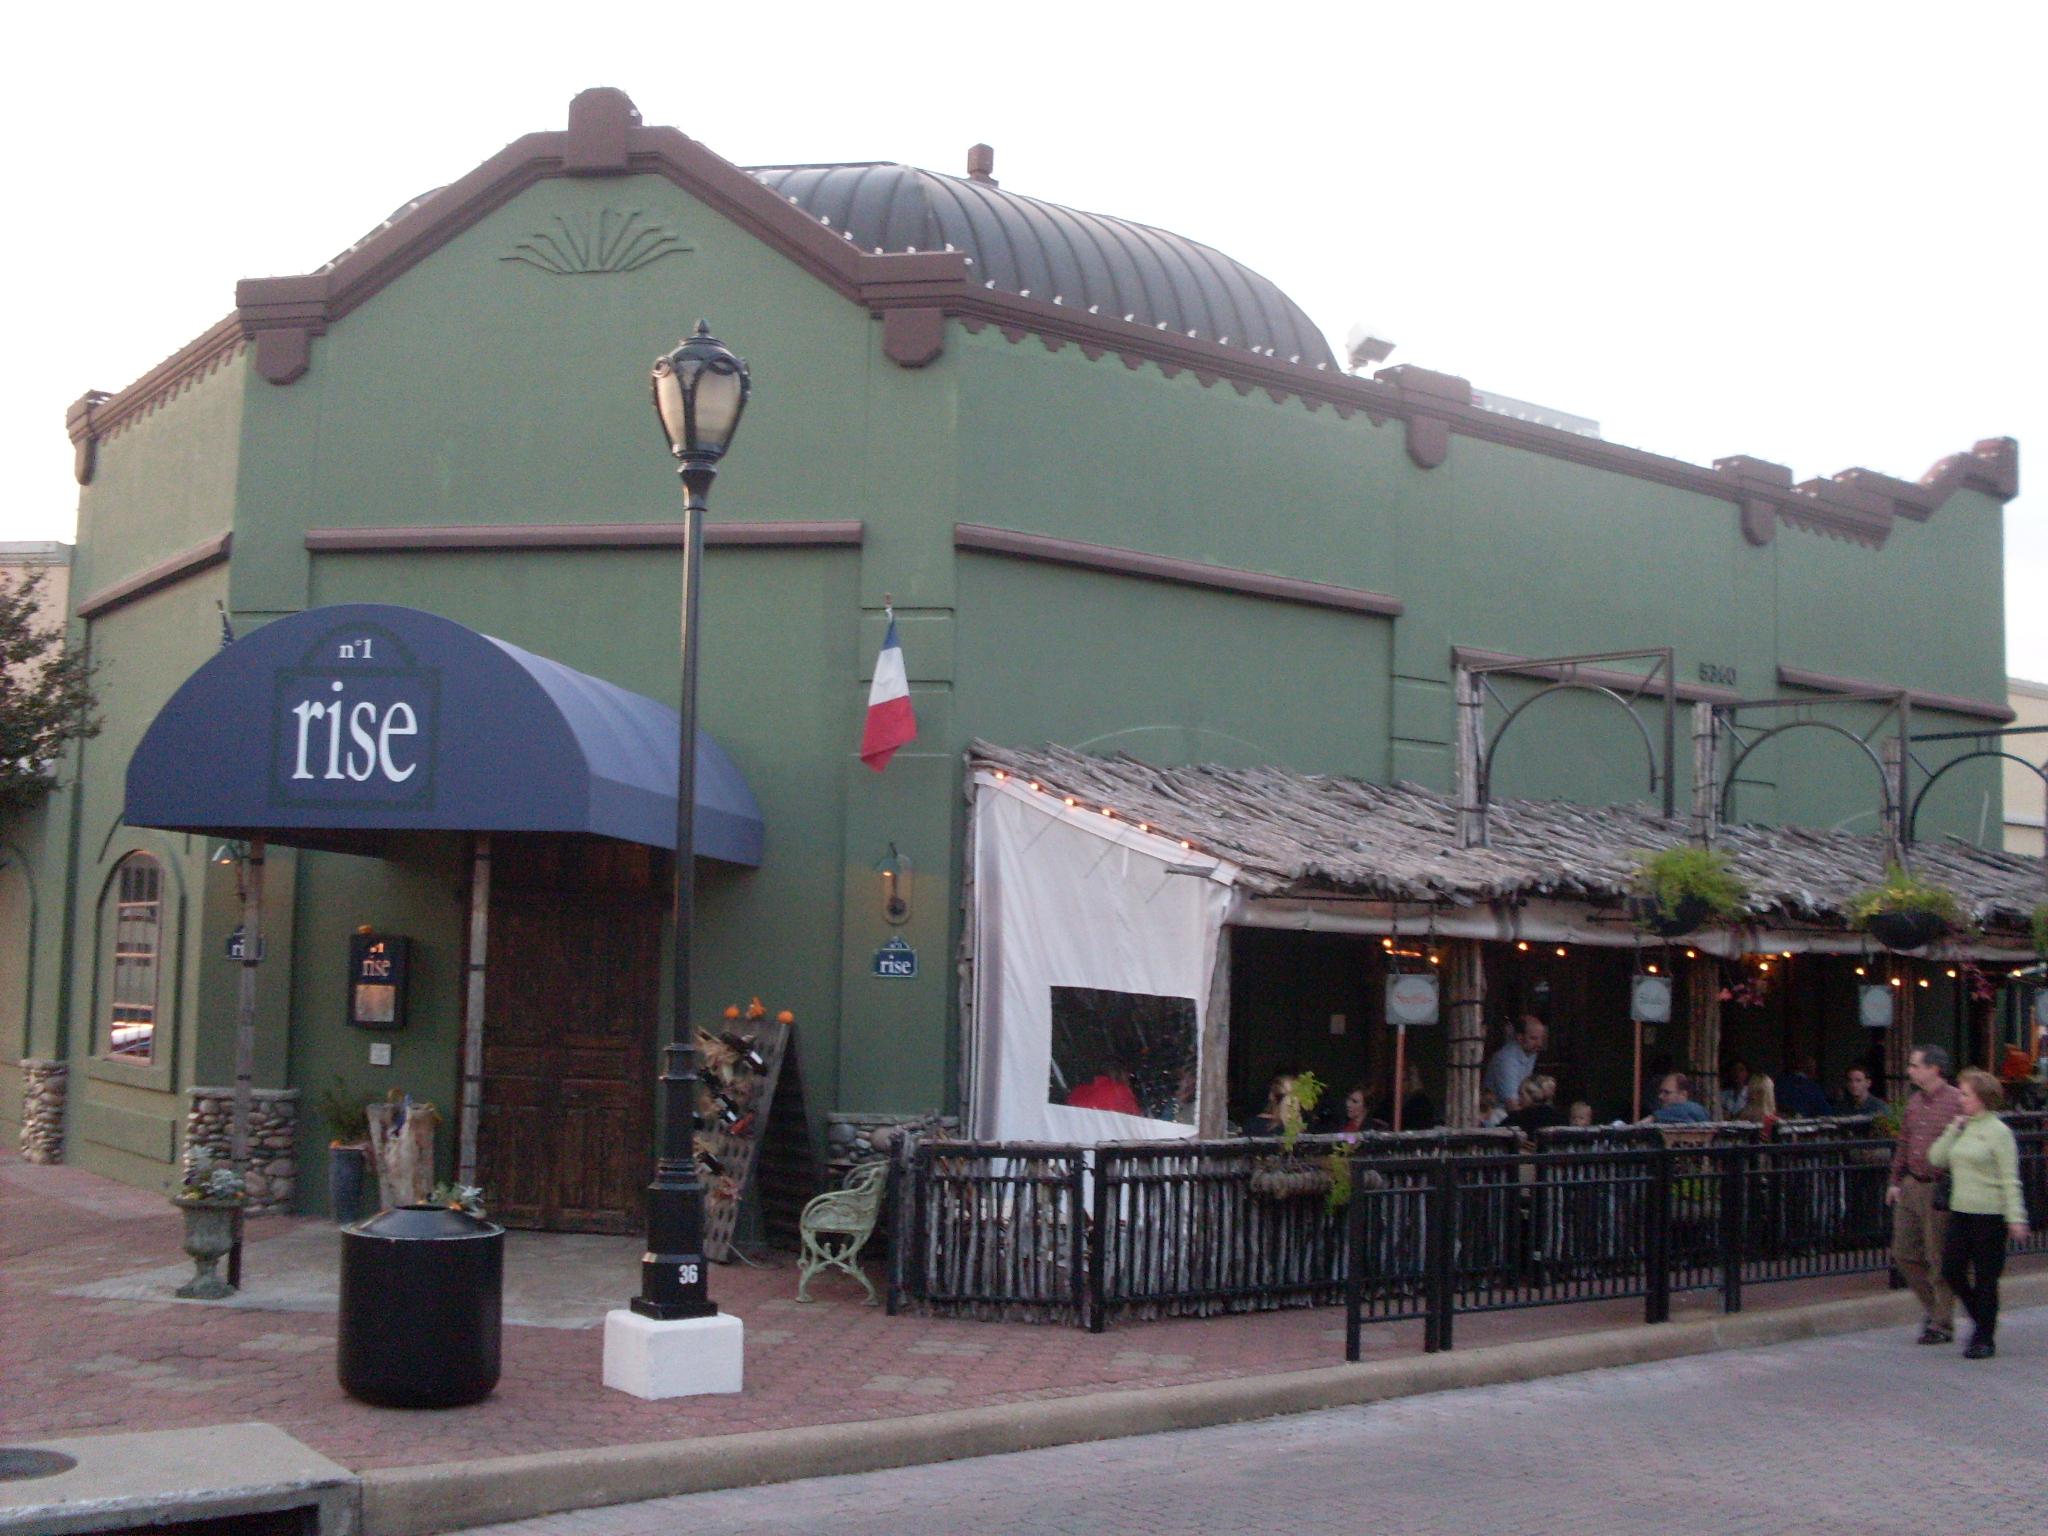 Rise restaurant in Inwood Village, Dallas, TX